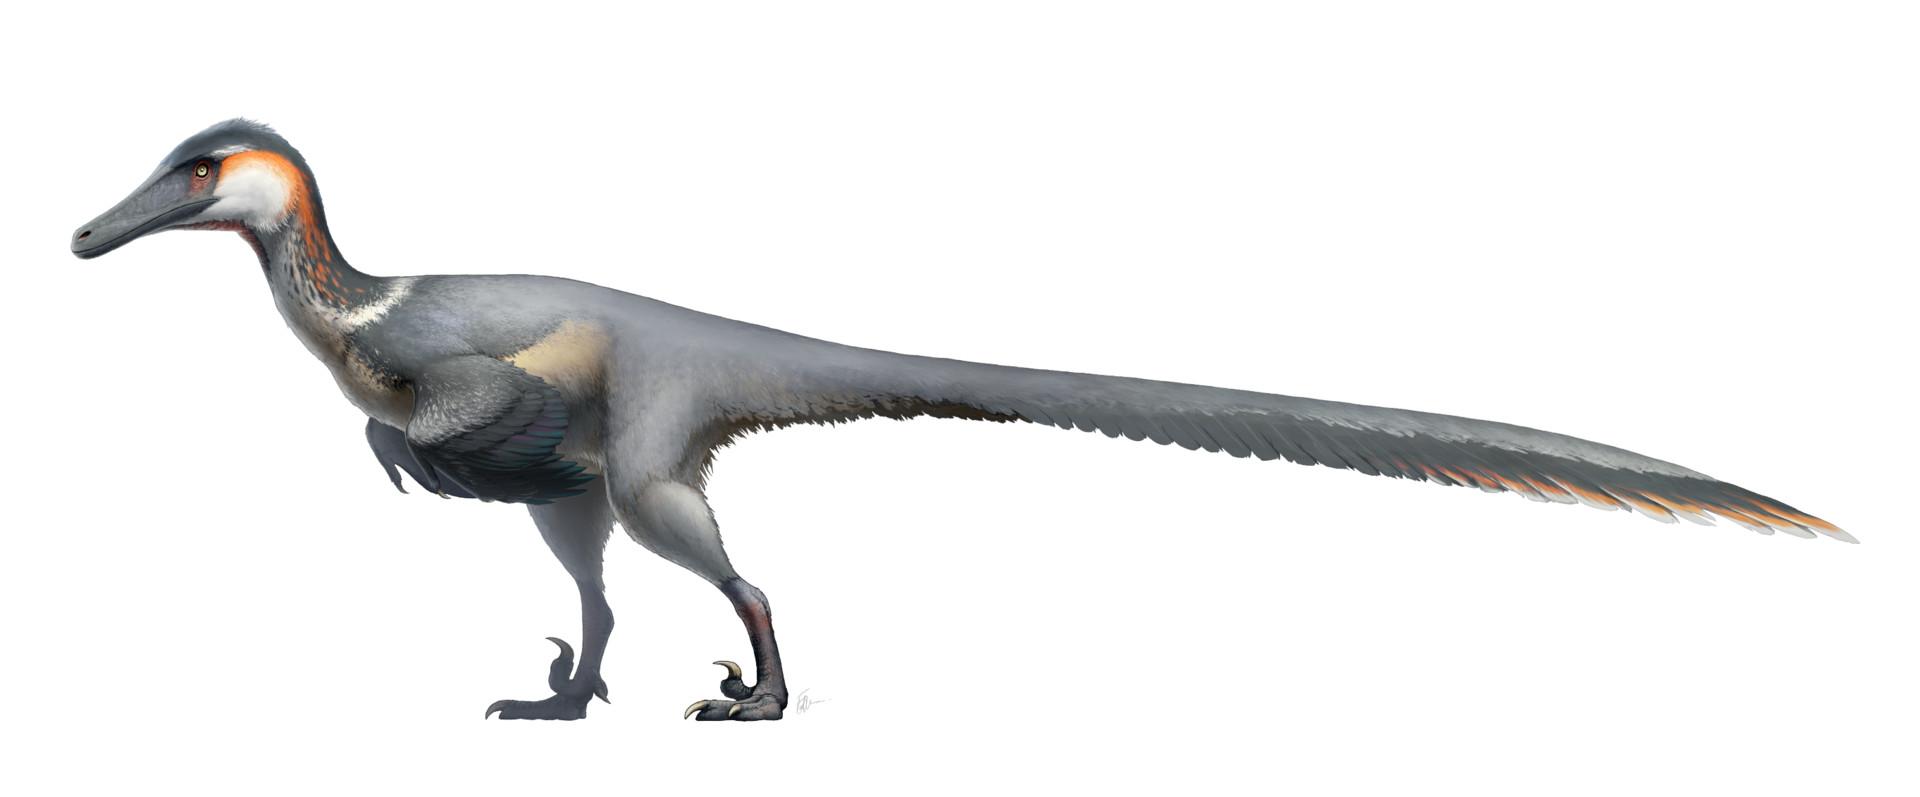 fred-wierum-dromaeosaurs-austro2.jpg